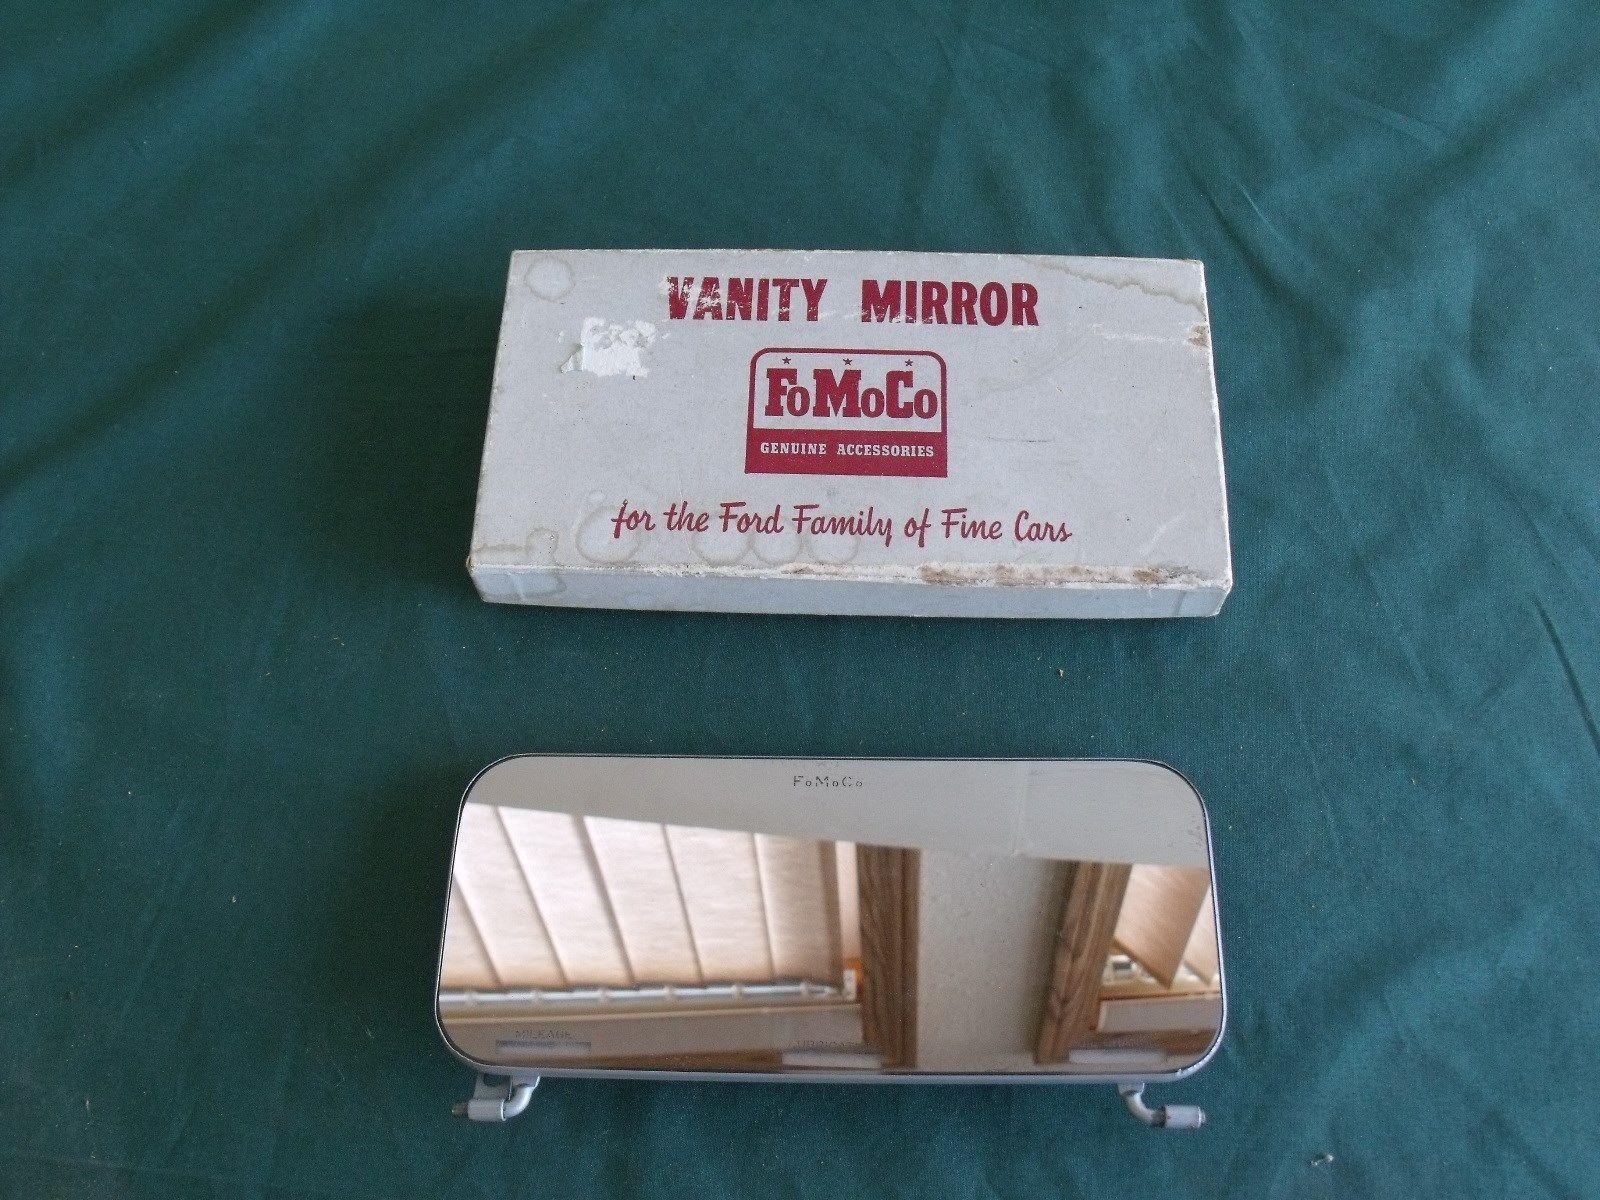 1963 ford galaxie parts ebay - 1959 1960 1963 1964 1965 1966 Ford Galaxie Vanity Mirror Mustang 65 Fomoco Ebay